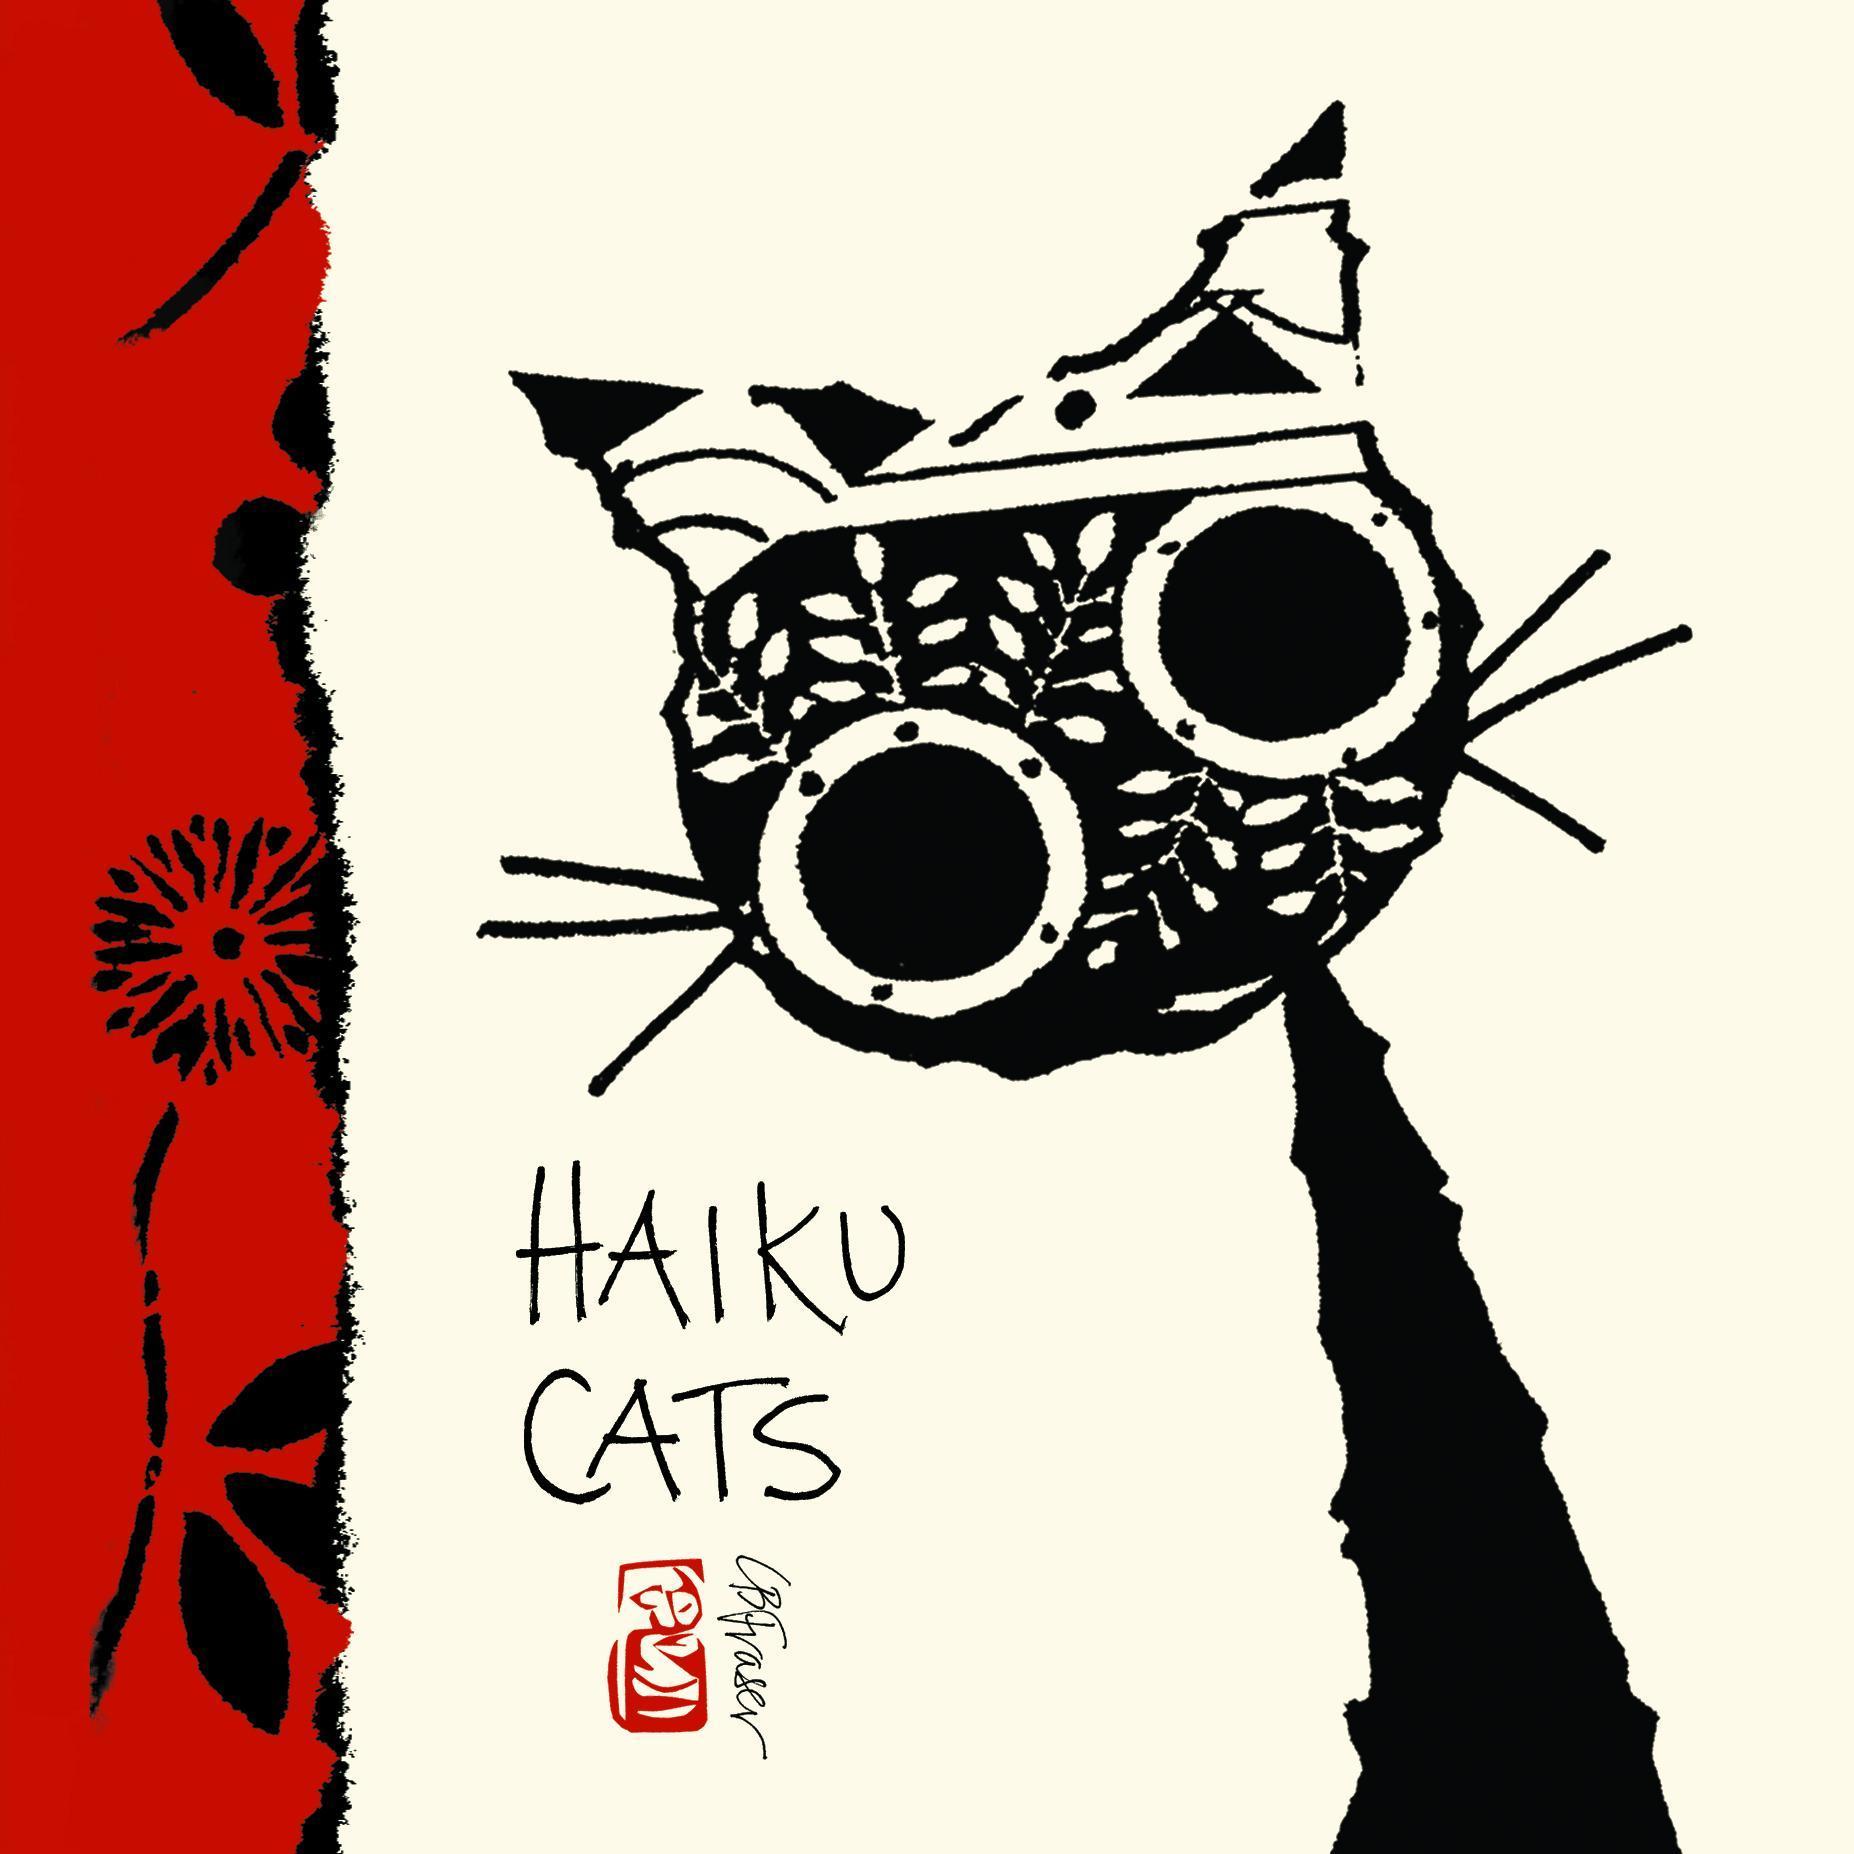 Haiku Cats On Twitter Nationalpretzelday Opentointerpretation